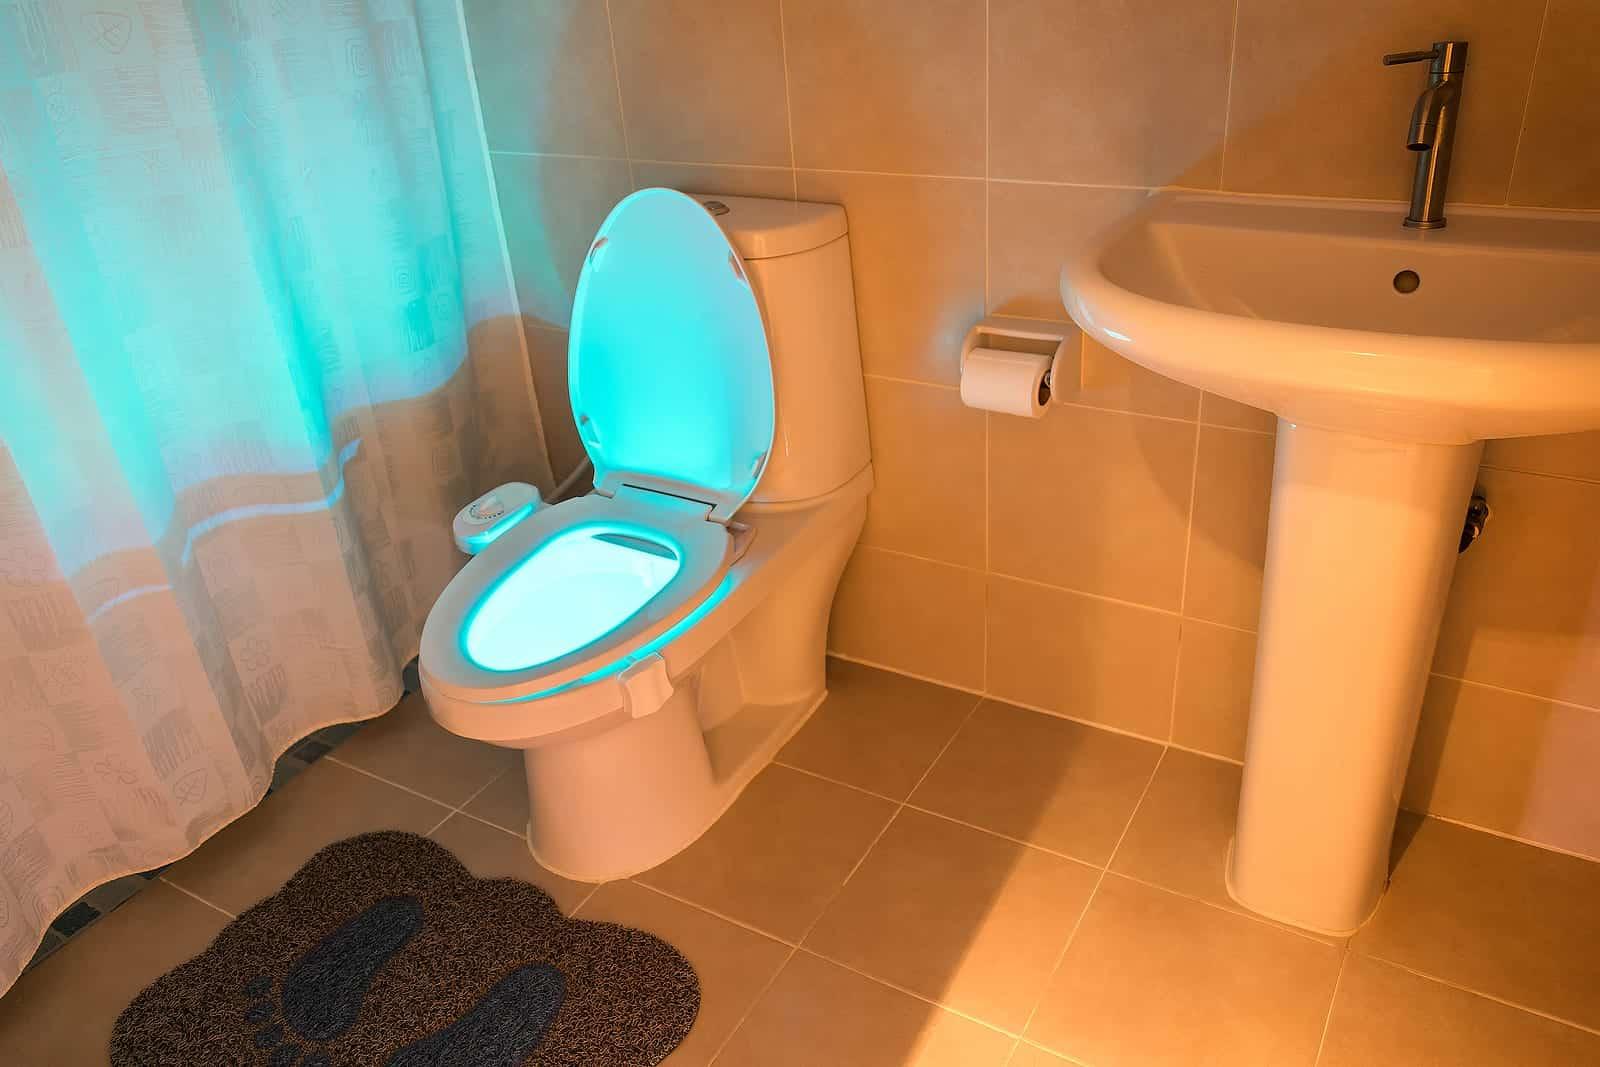 Toilet that Glows in a Standard Modern Bathroom